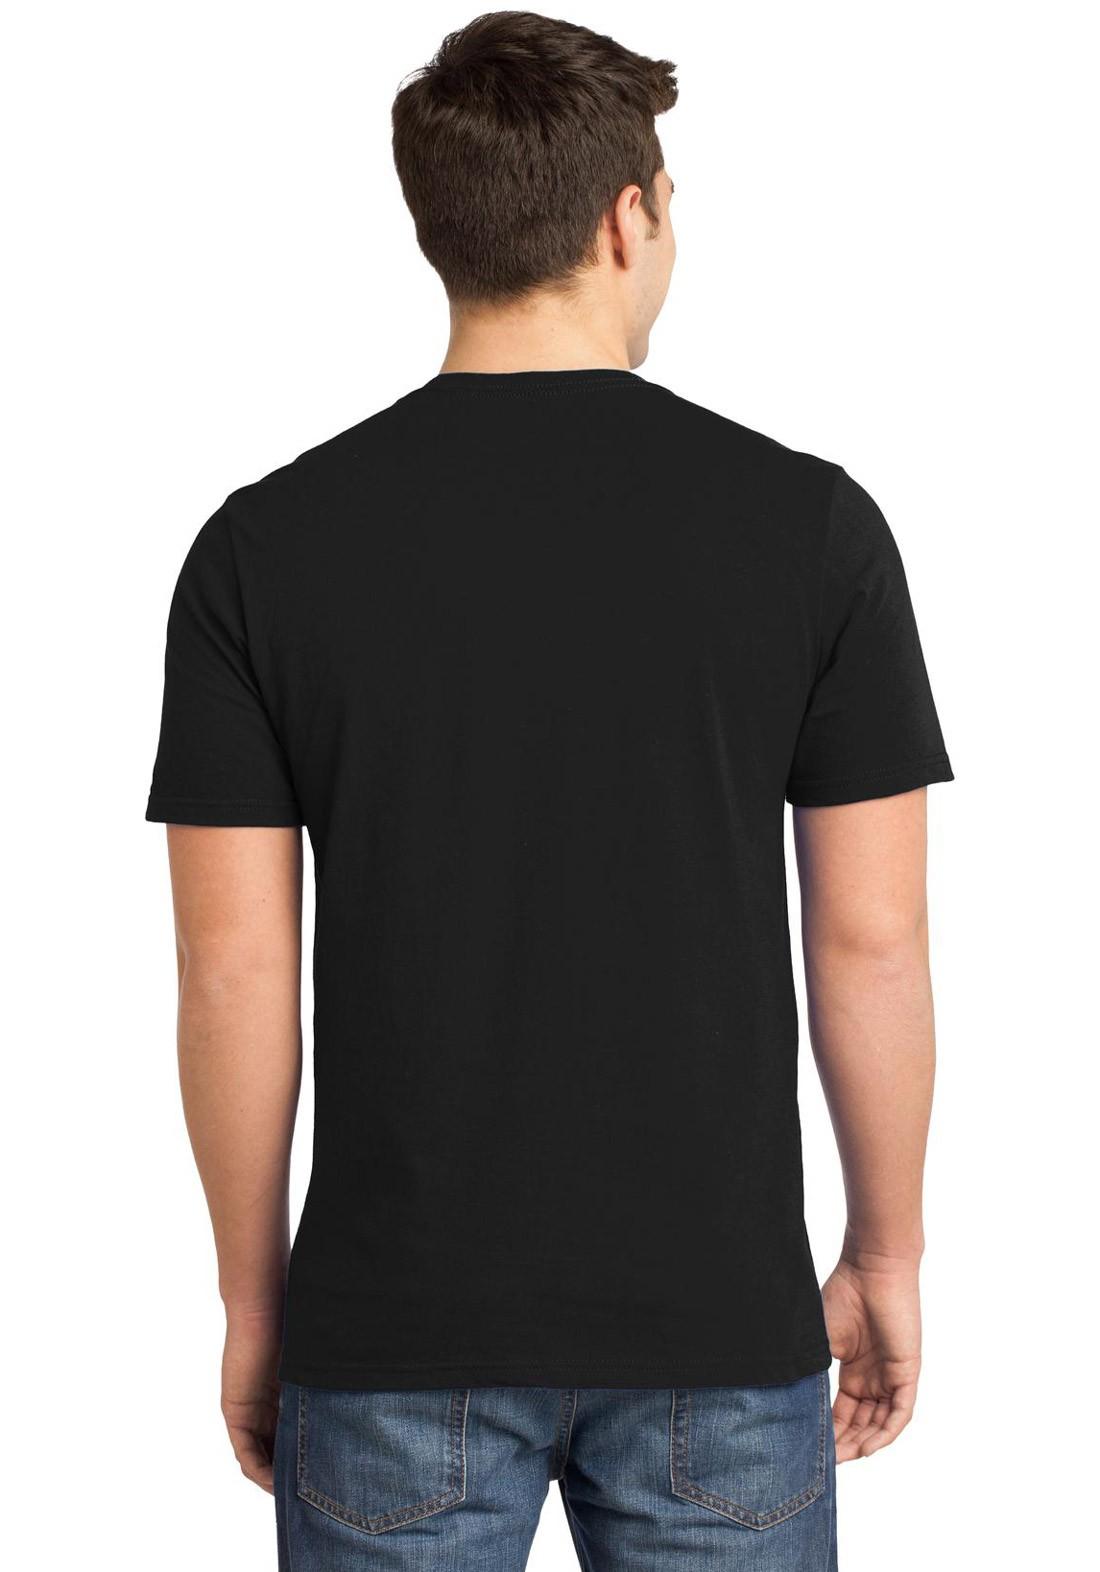 Camiseta Masculina Universitária Faculdade Jornalismo